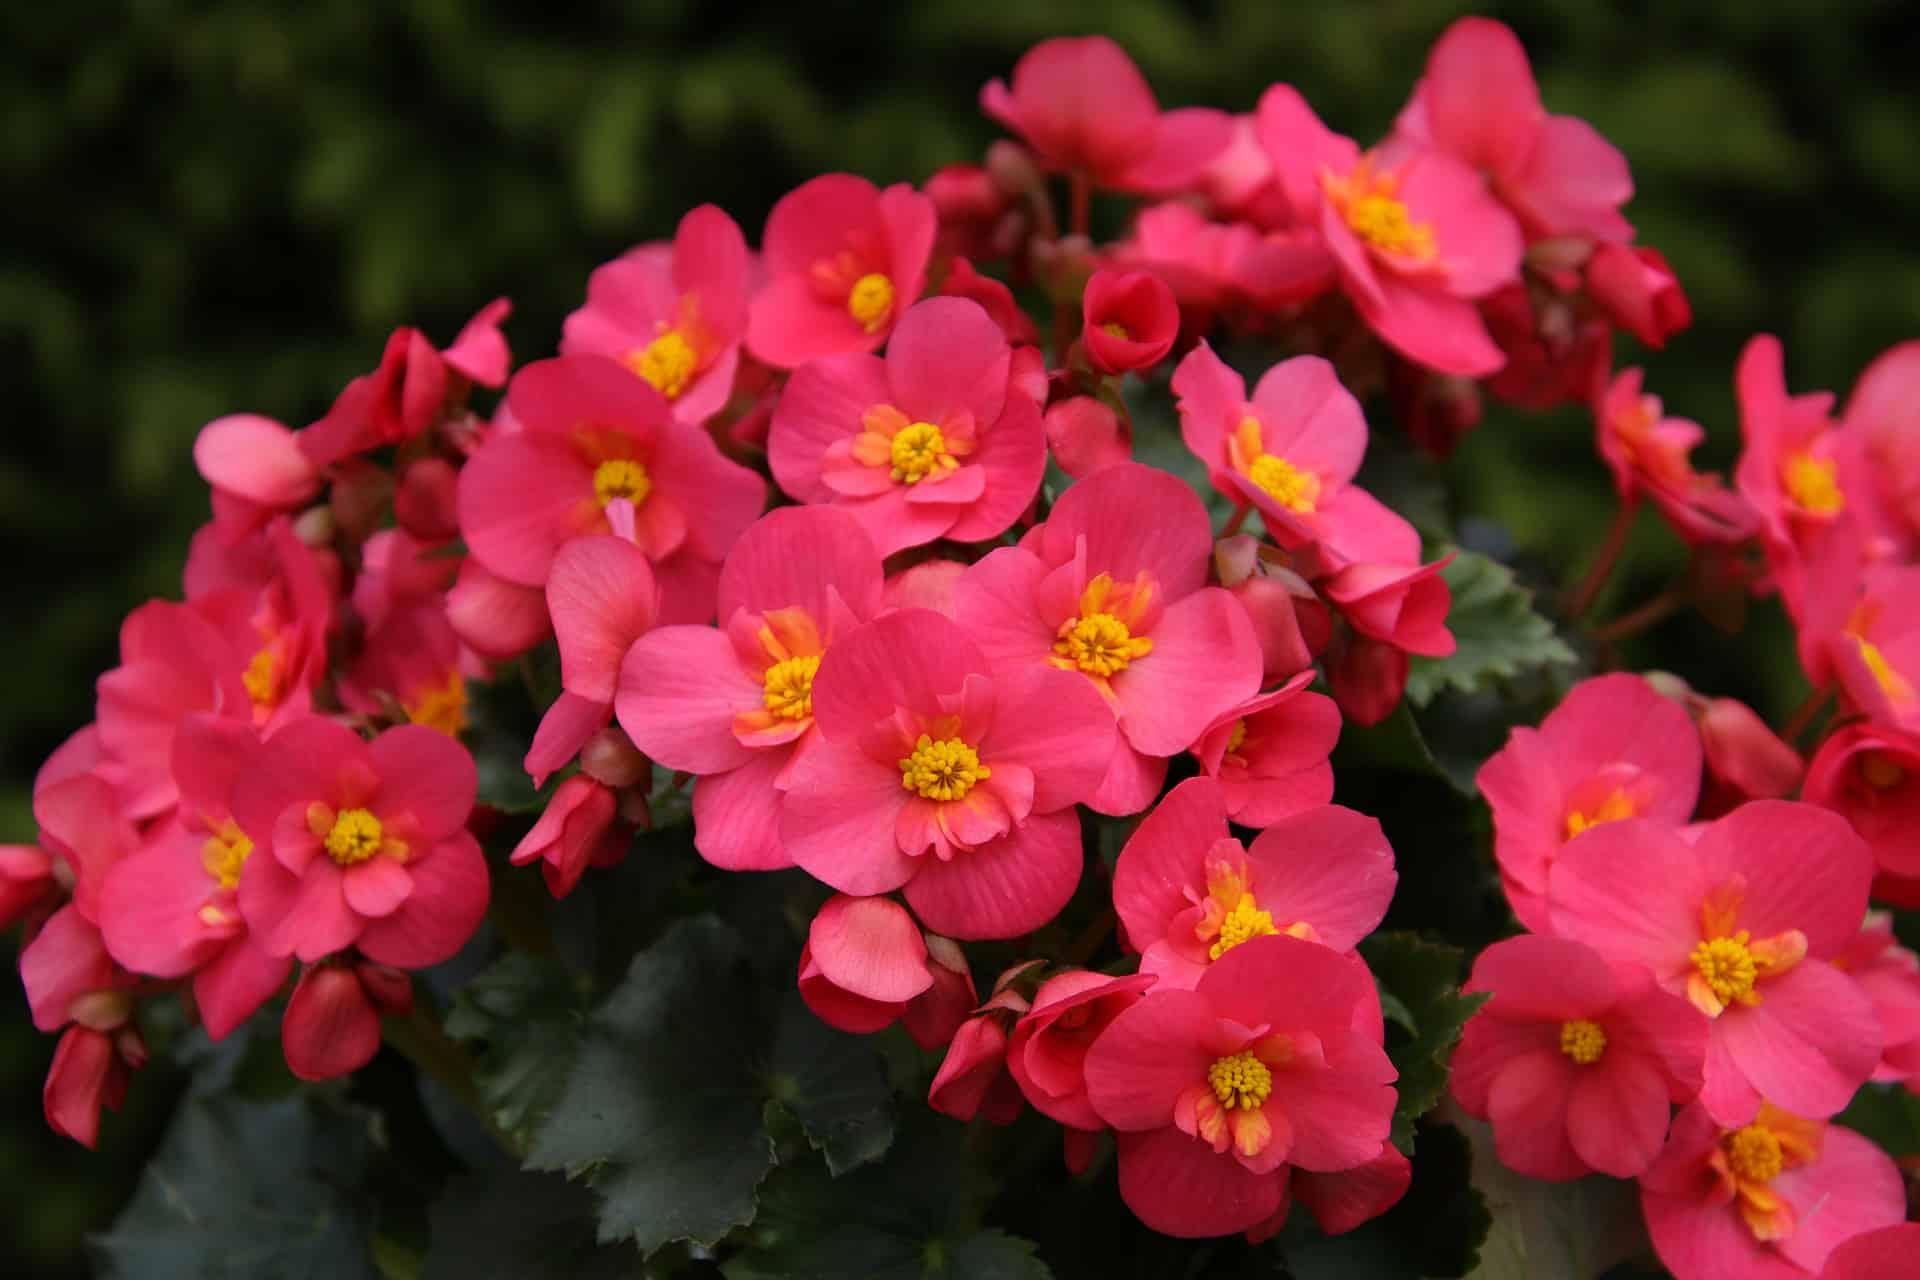 Best Fertilizer for Begonias